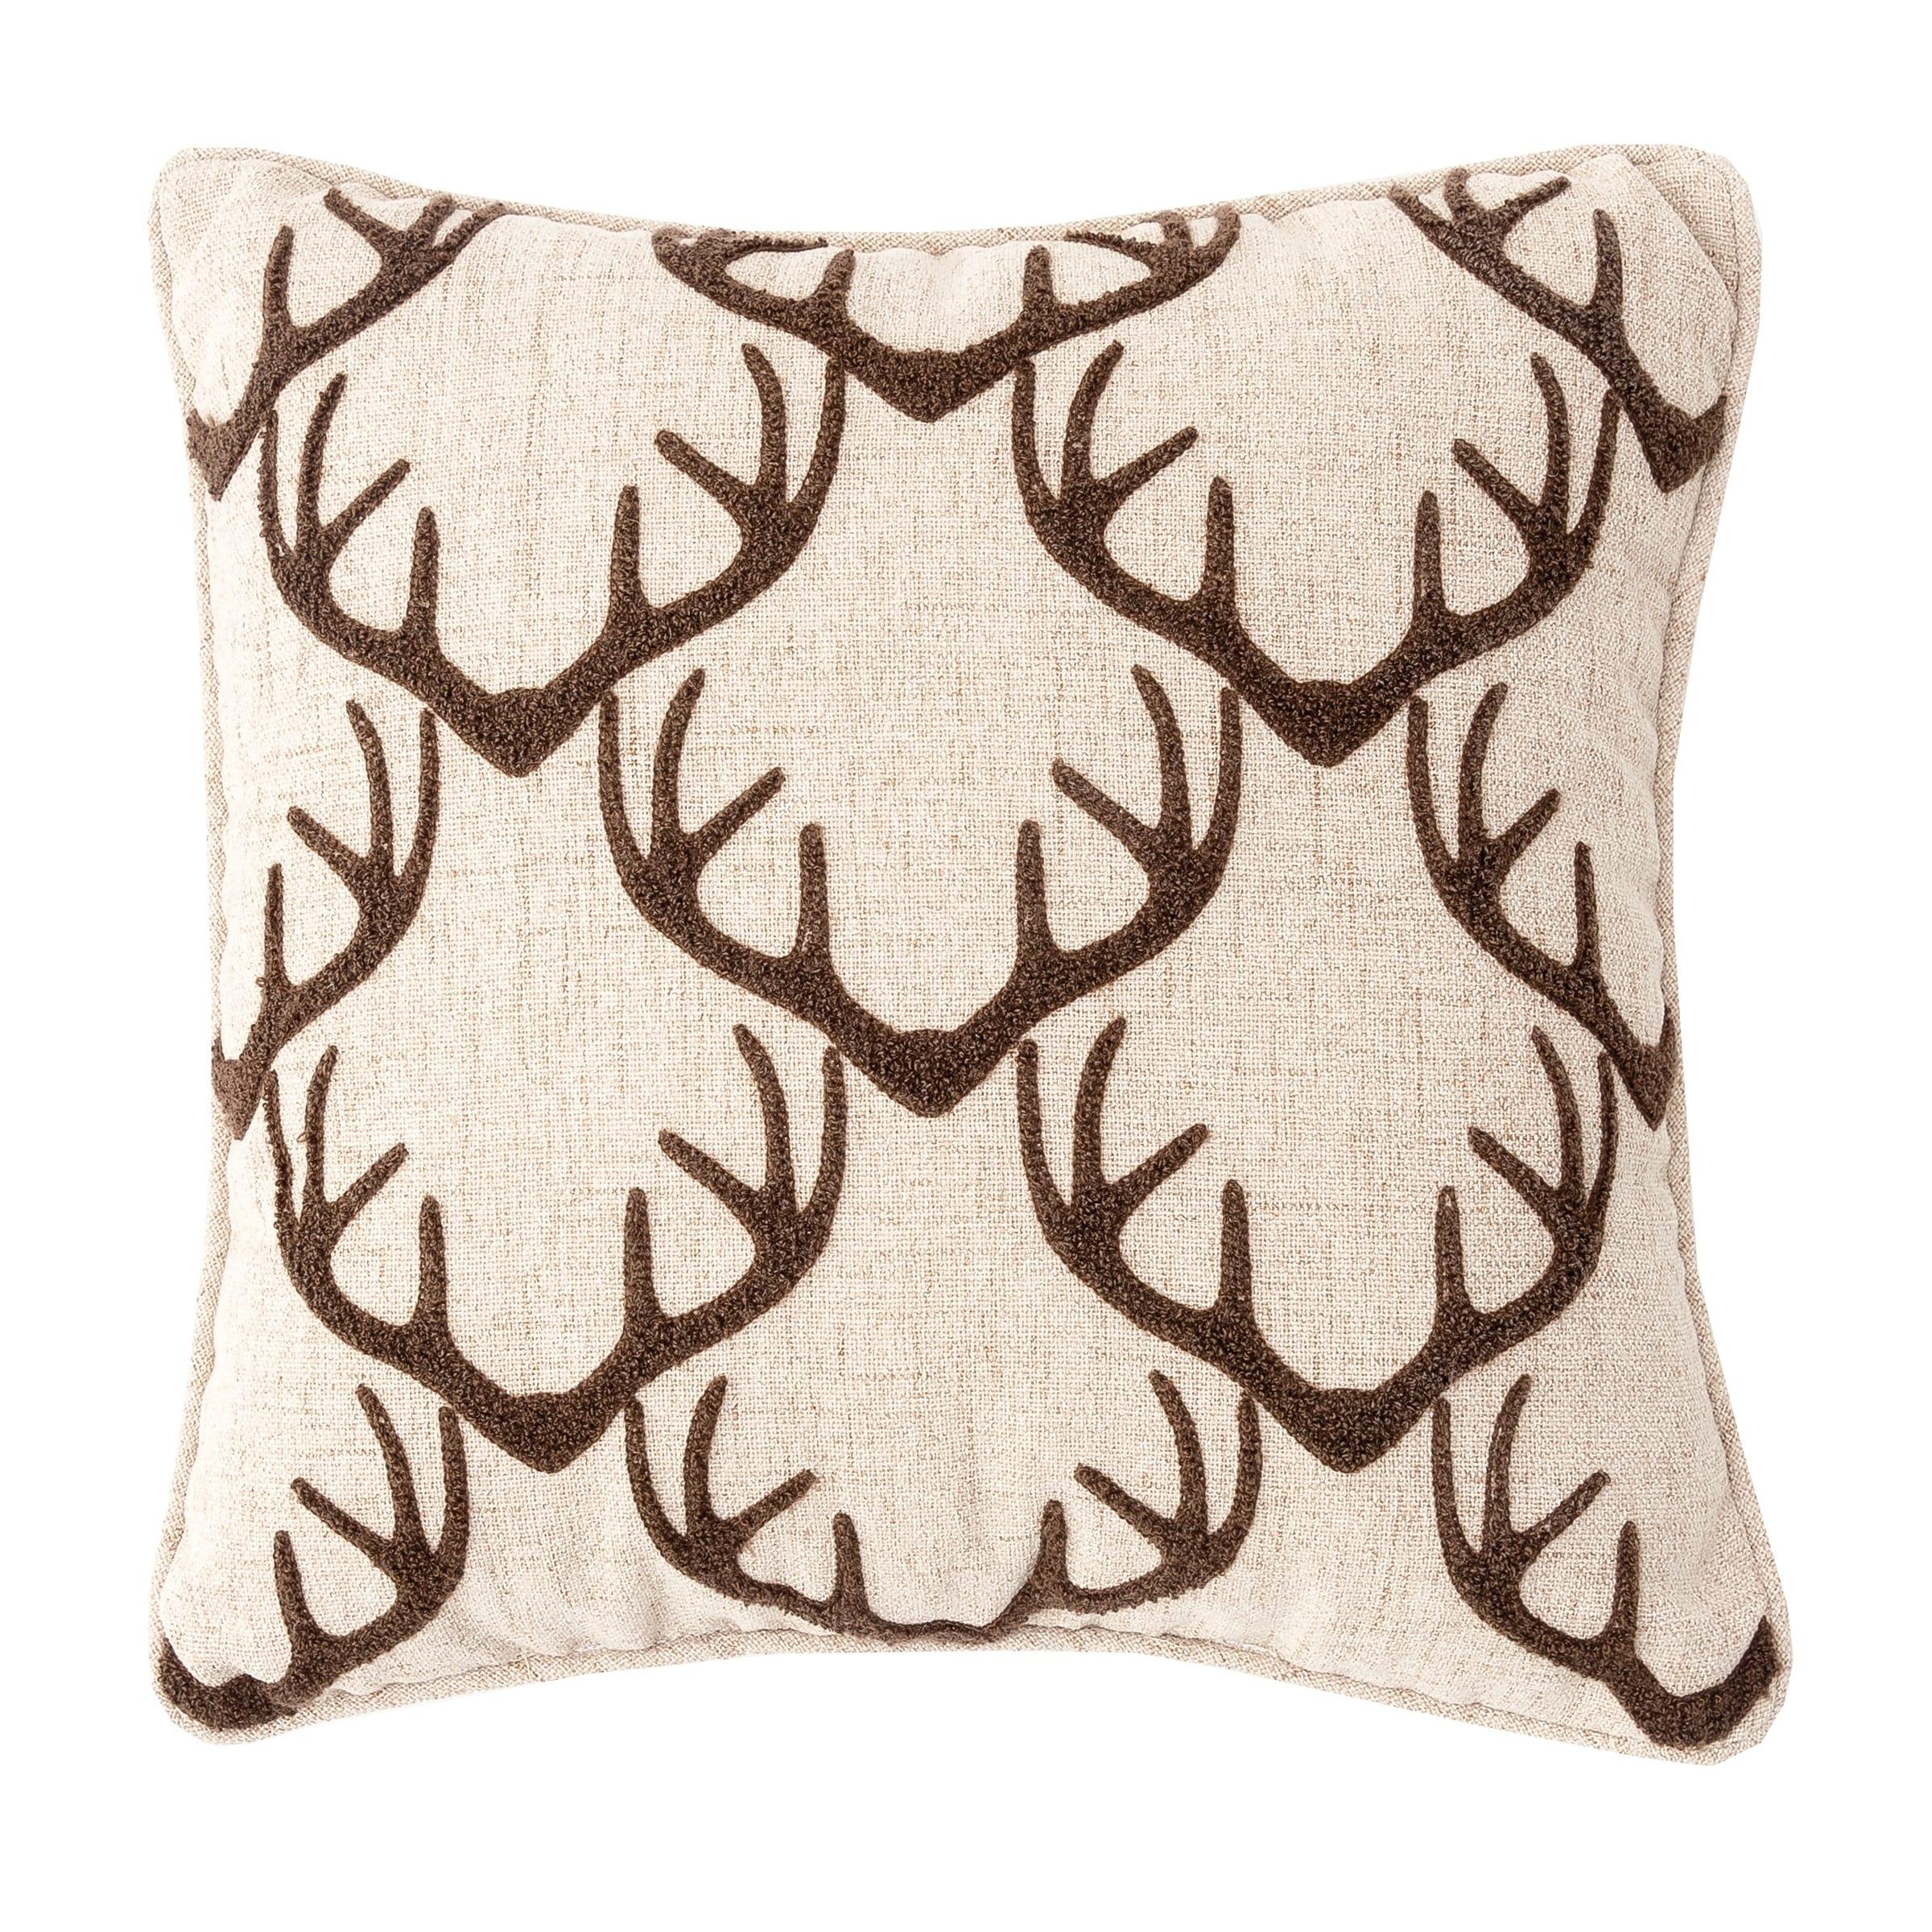 Antler Argyle Tufted 16 x 16 Pillow